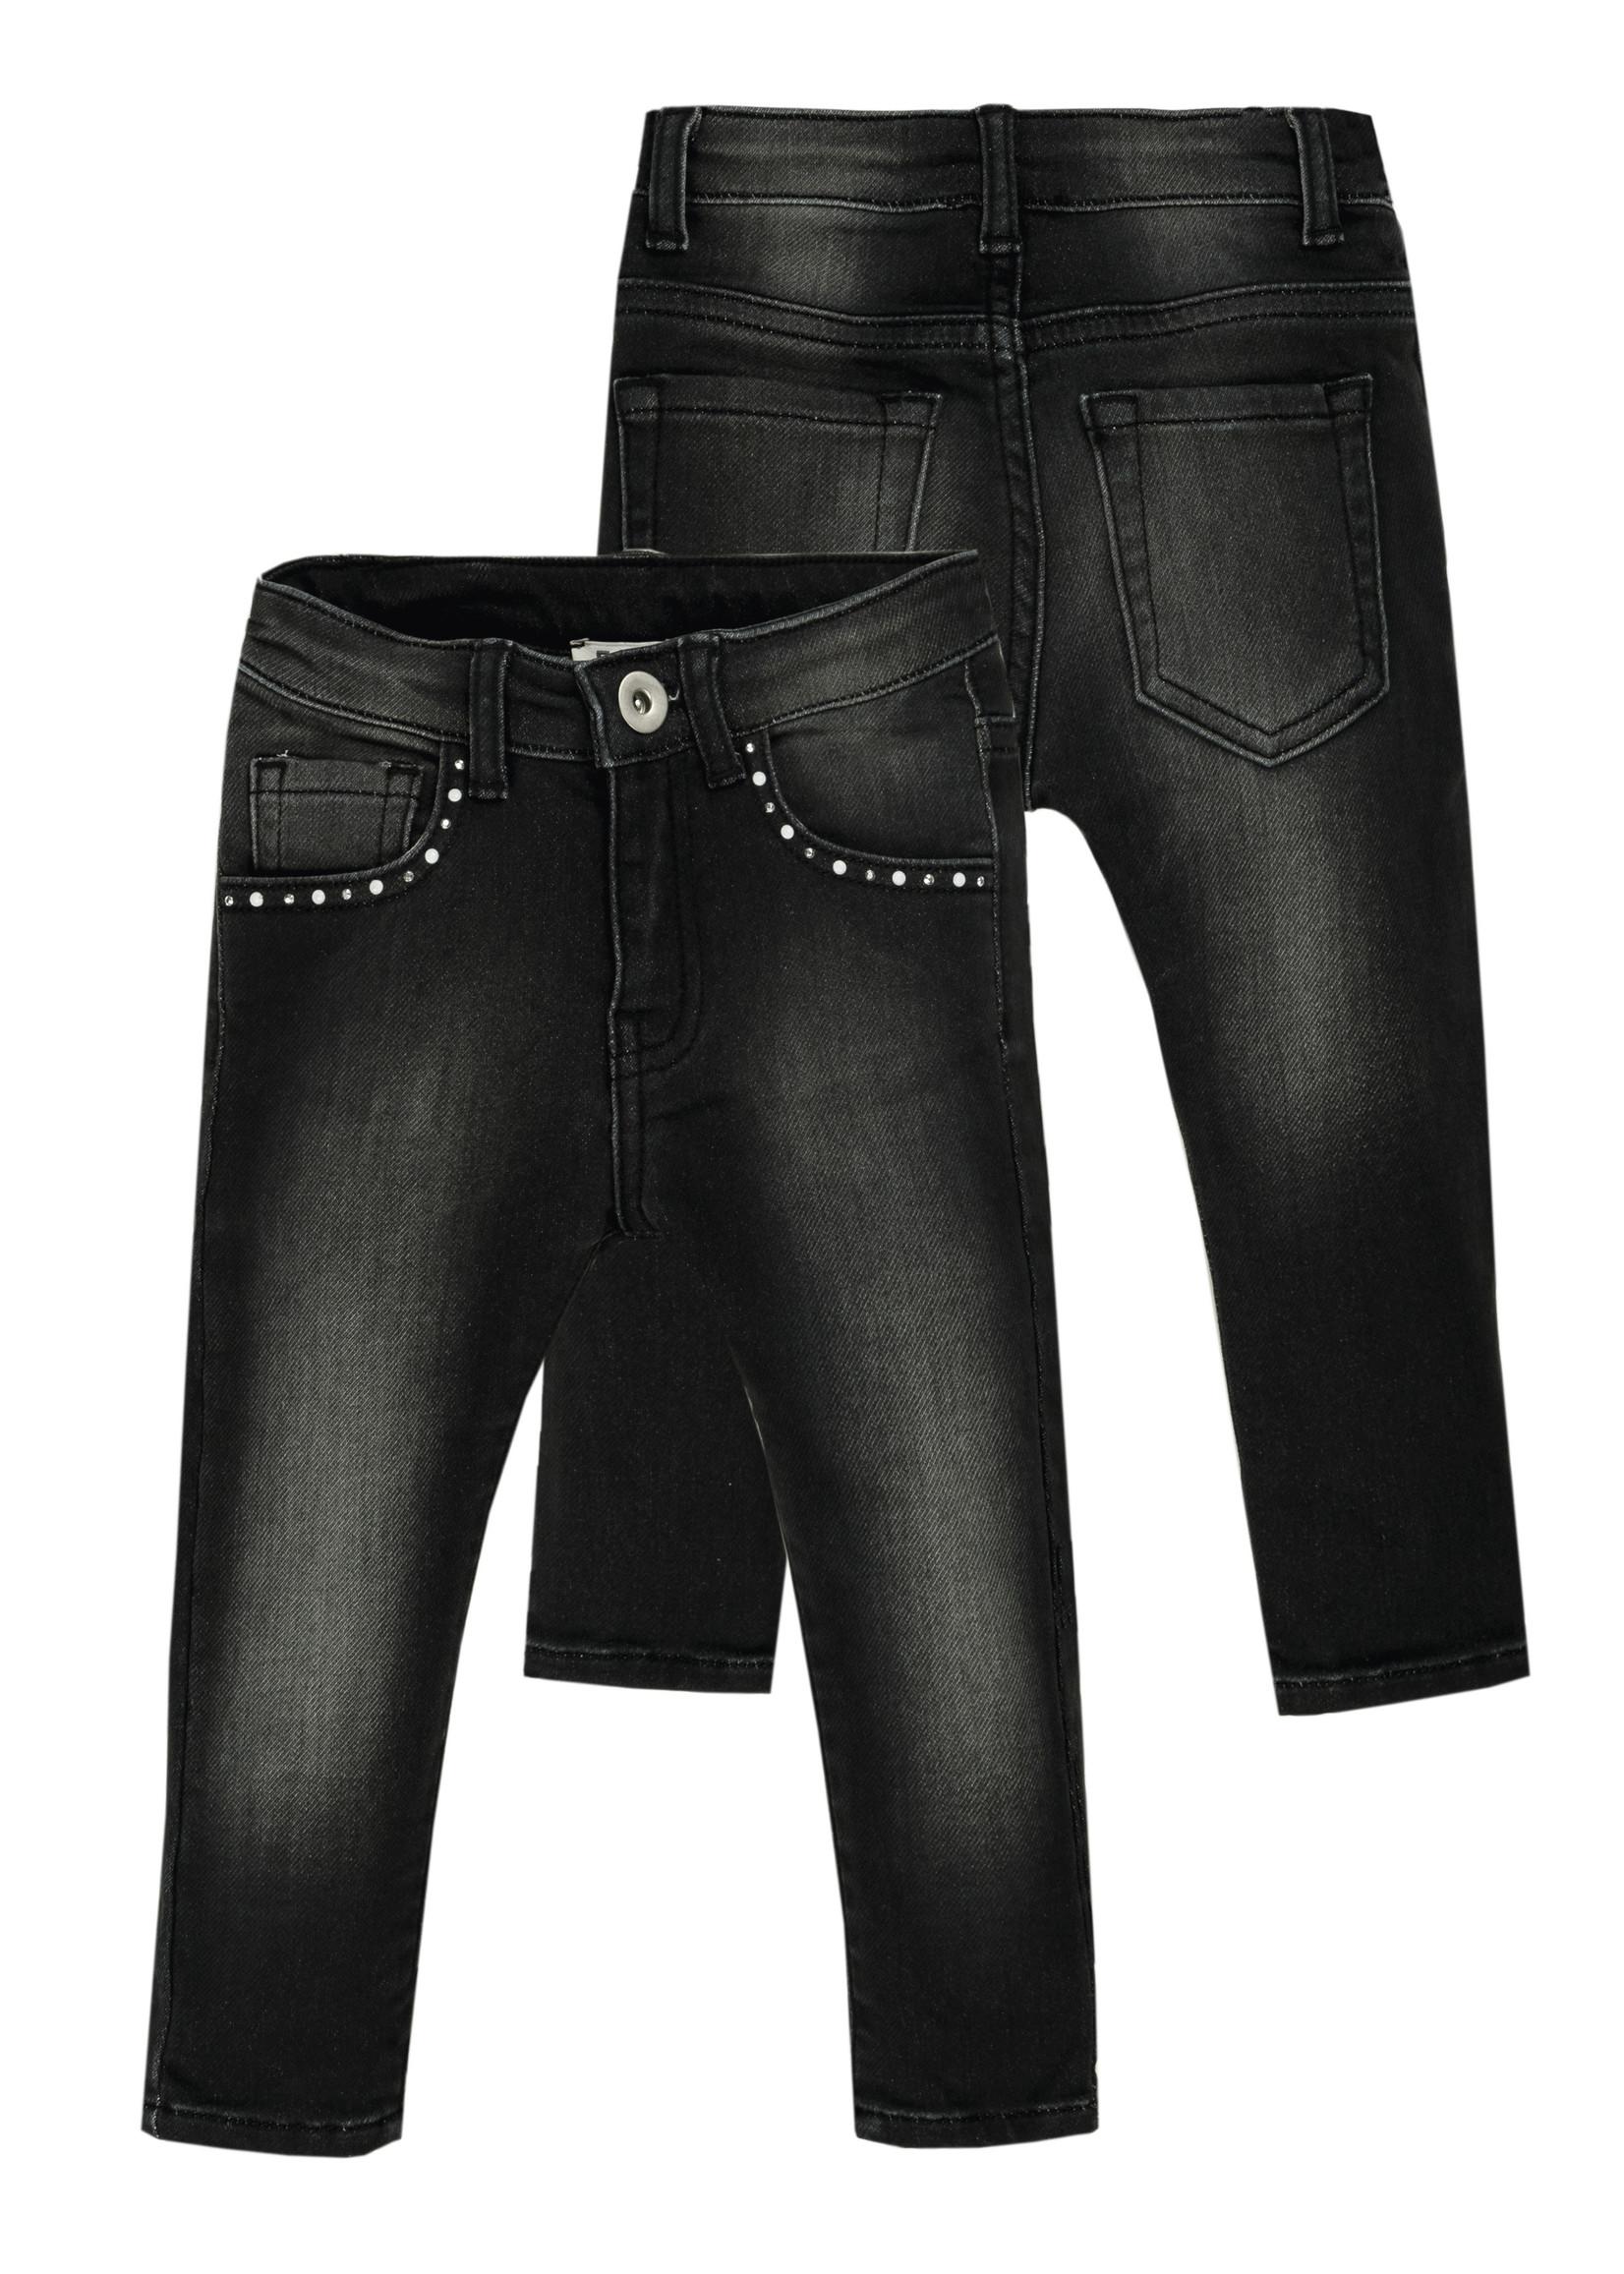 EMC EMC denim trousers for girls grey